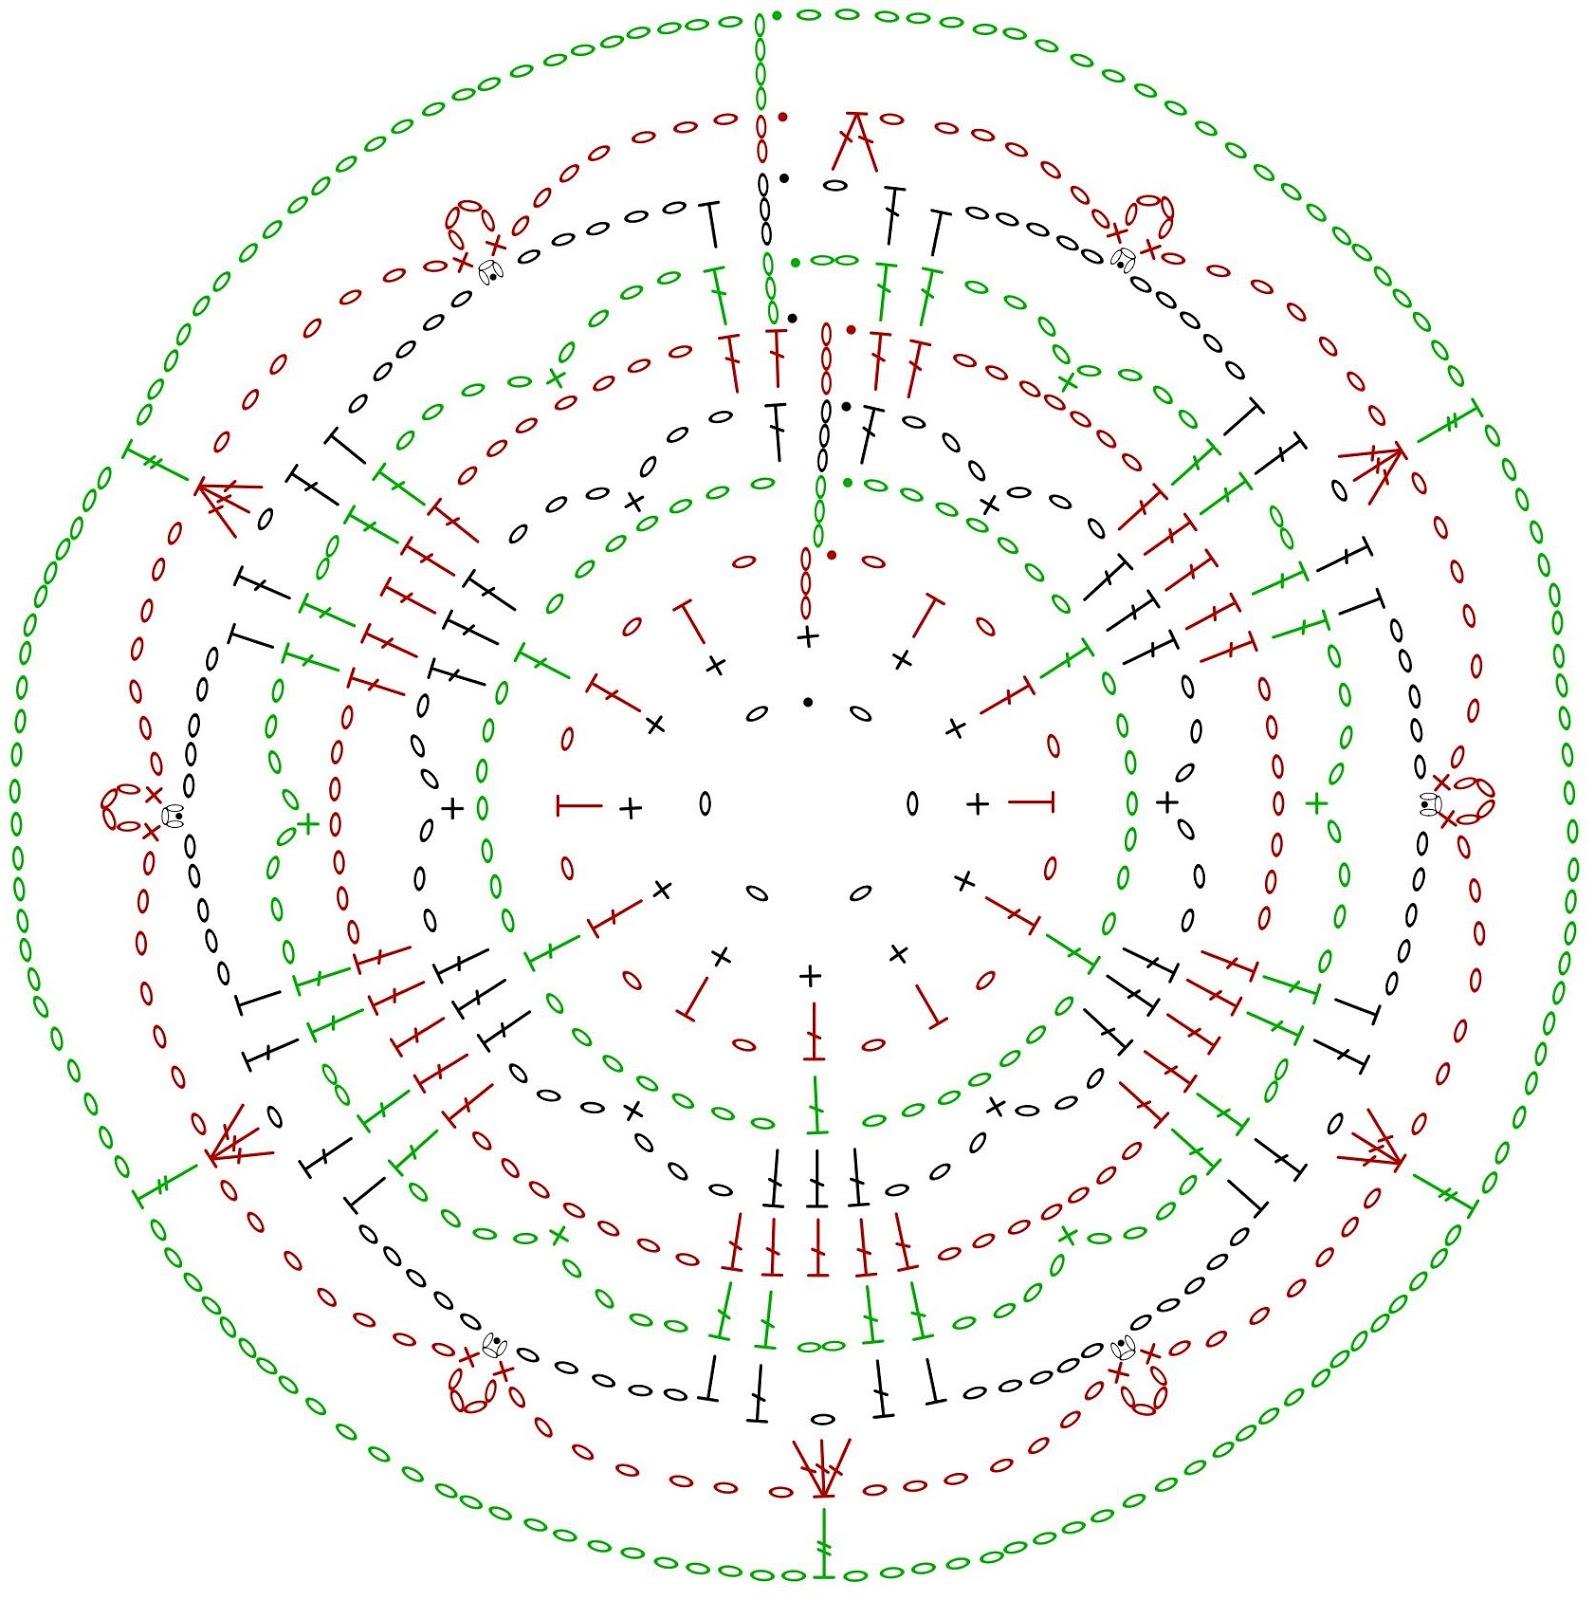 Grid Mammal Crafts Last Minute Part 2crochet Snowflakes Snowflakescrochetpatterndiagram Chart 1 Snowflake A